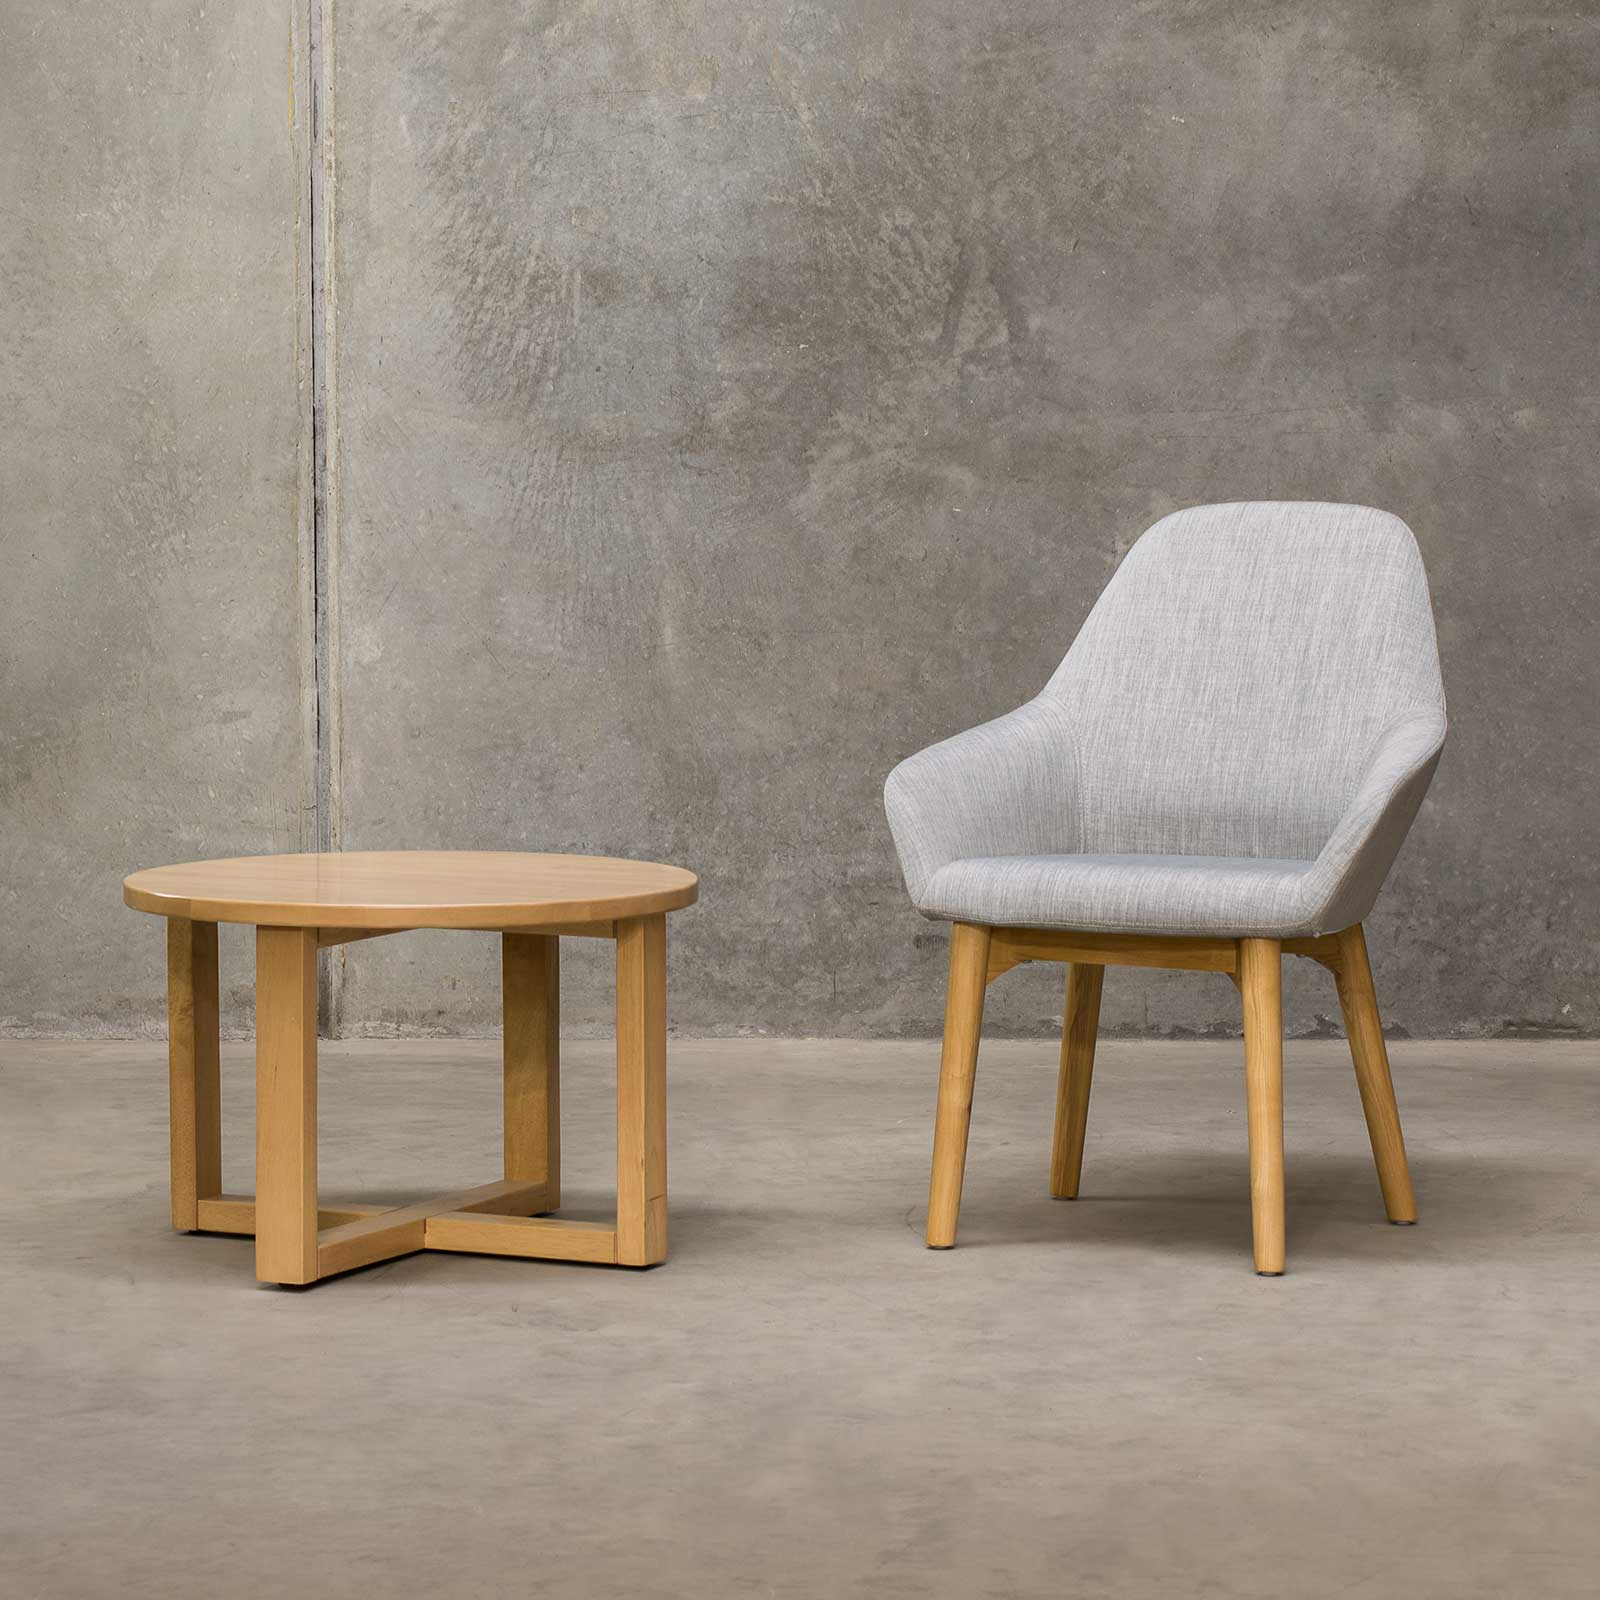 Coffee Shop Furniture Hot Tub: Furniture For Hospitality